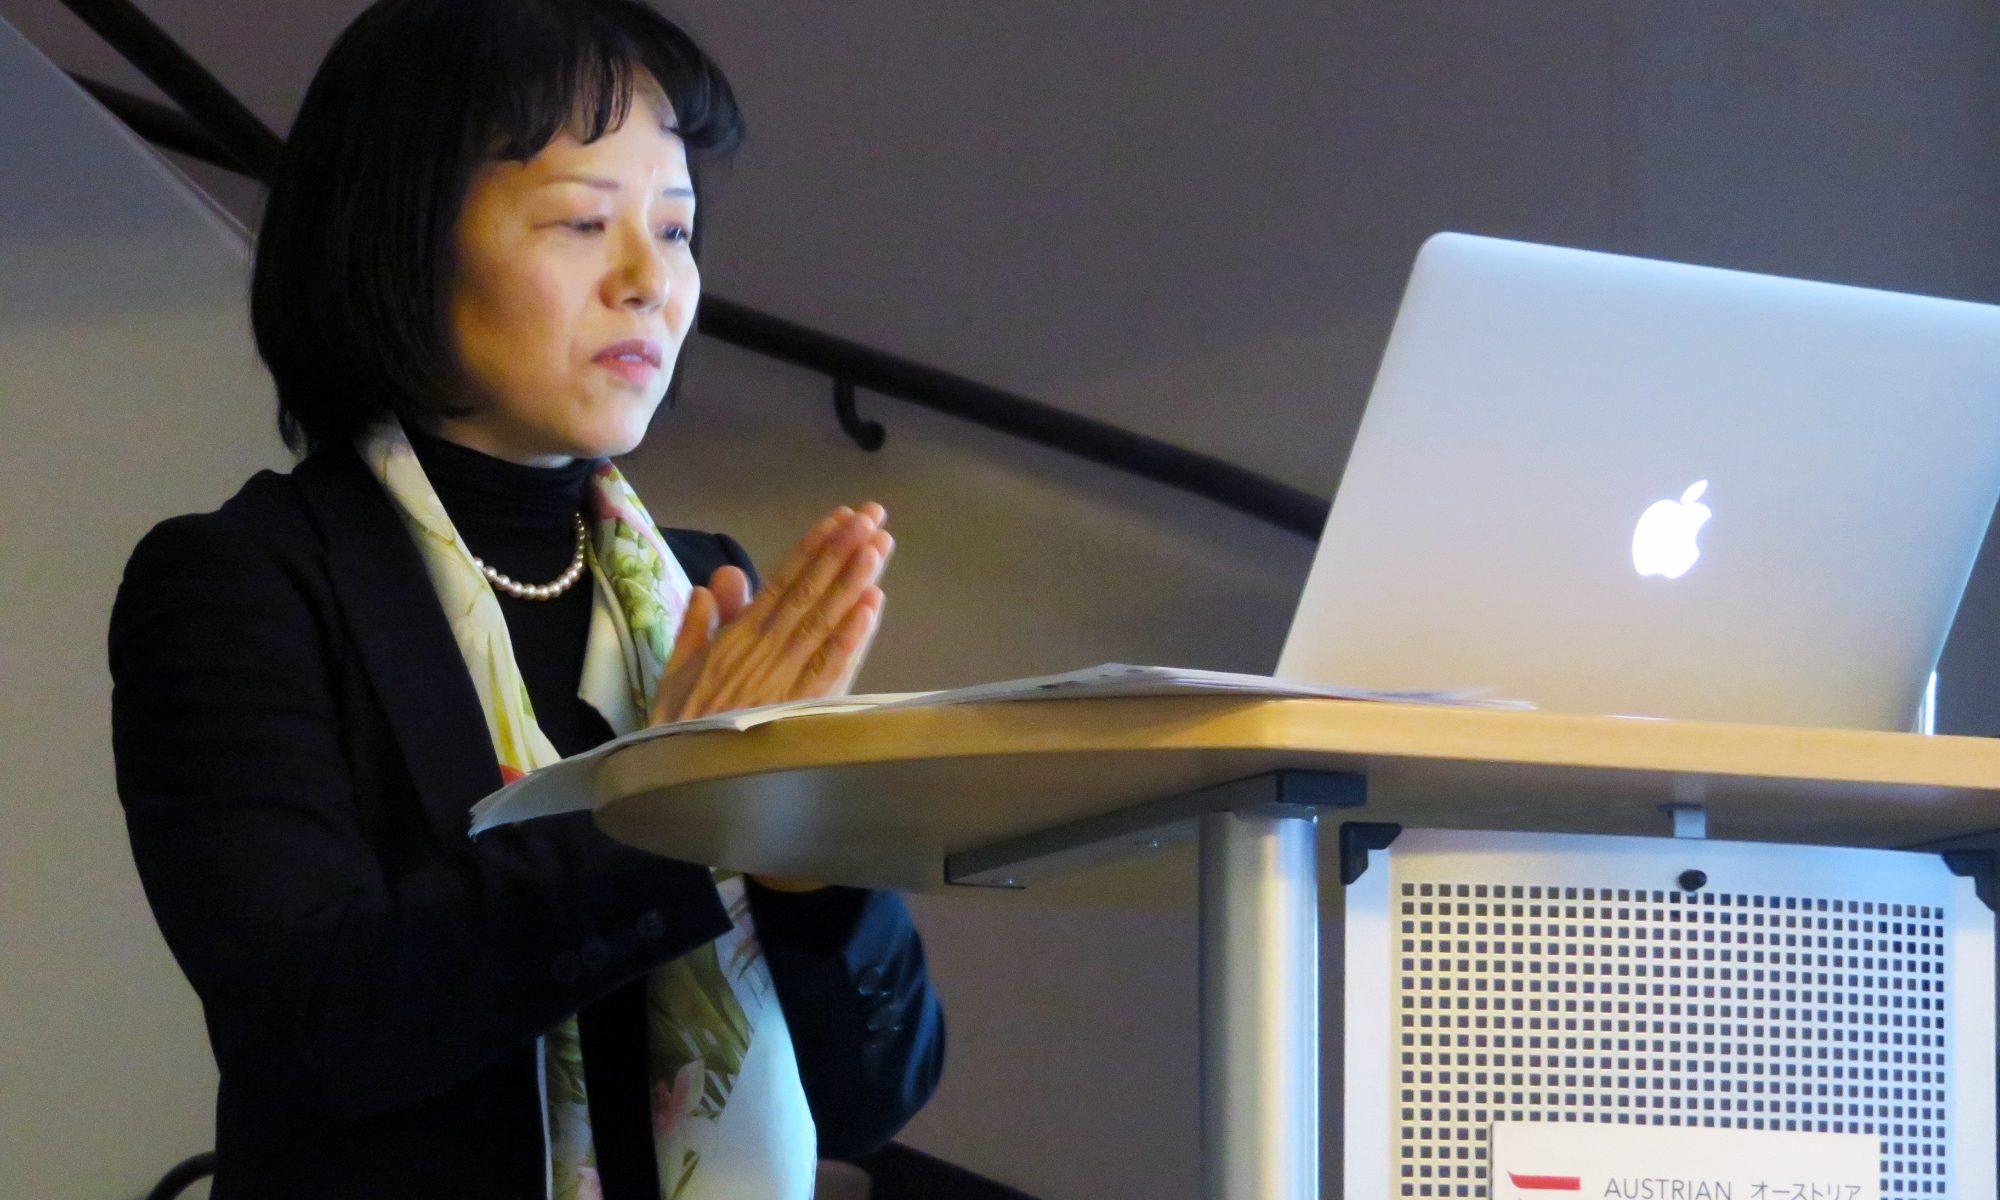 Yayoi Kamimura: Innovation – A style in Japan